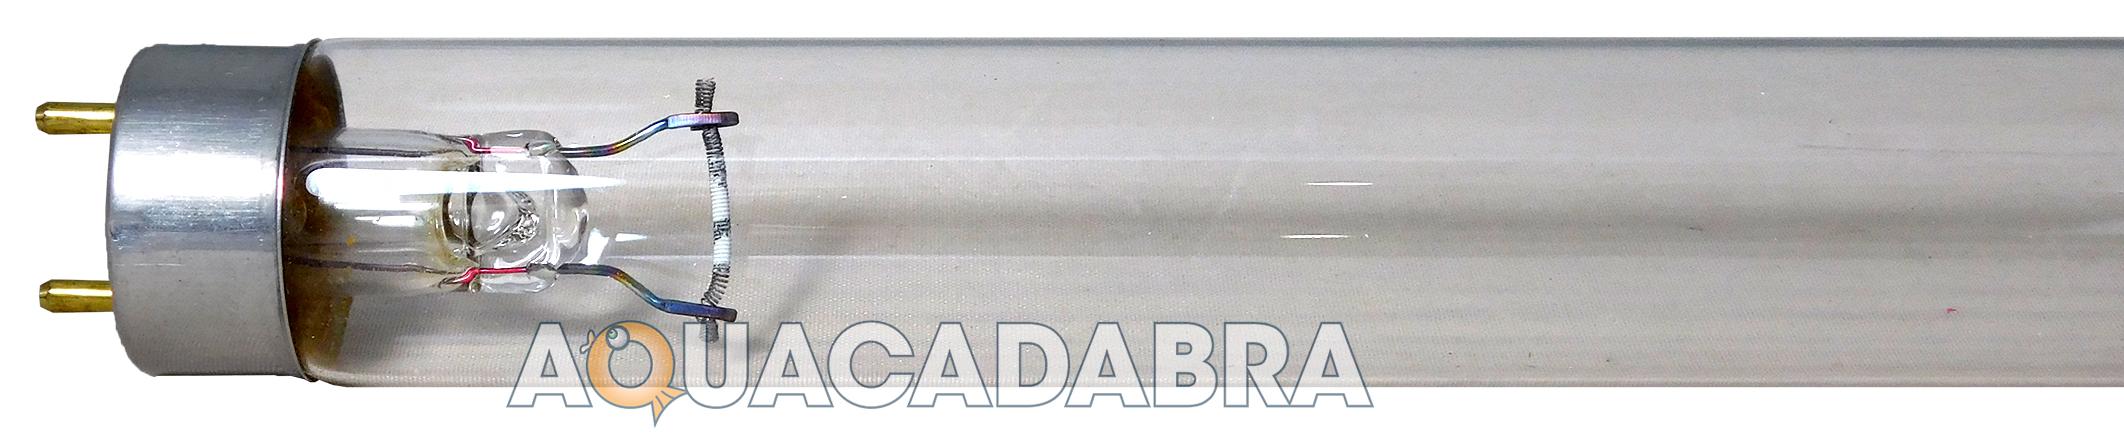 Tmc Vecton Uv Bulb Nano 200 300 400 600 Tube Lamp Replacement 6w 8w 15w 16w 25w Ebay